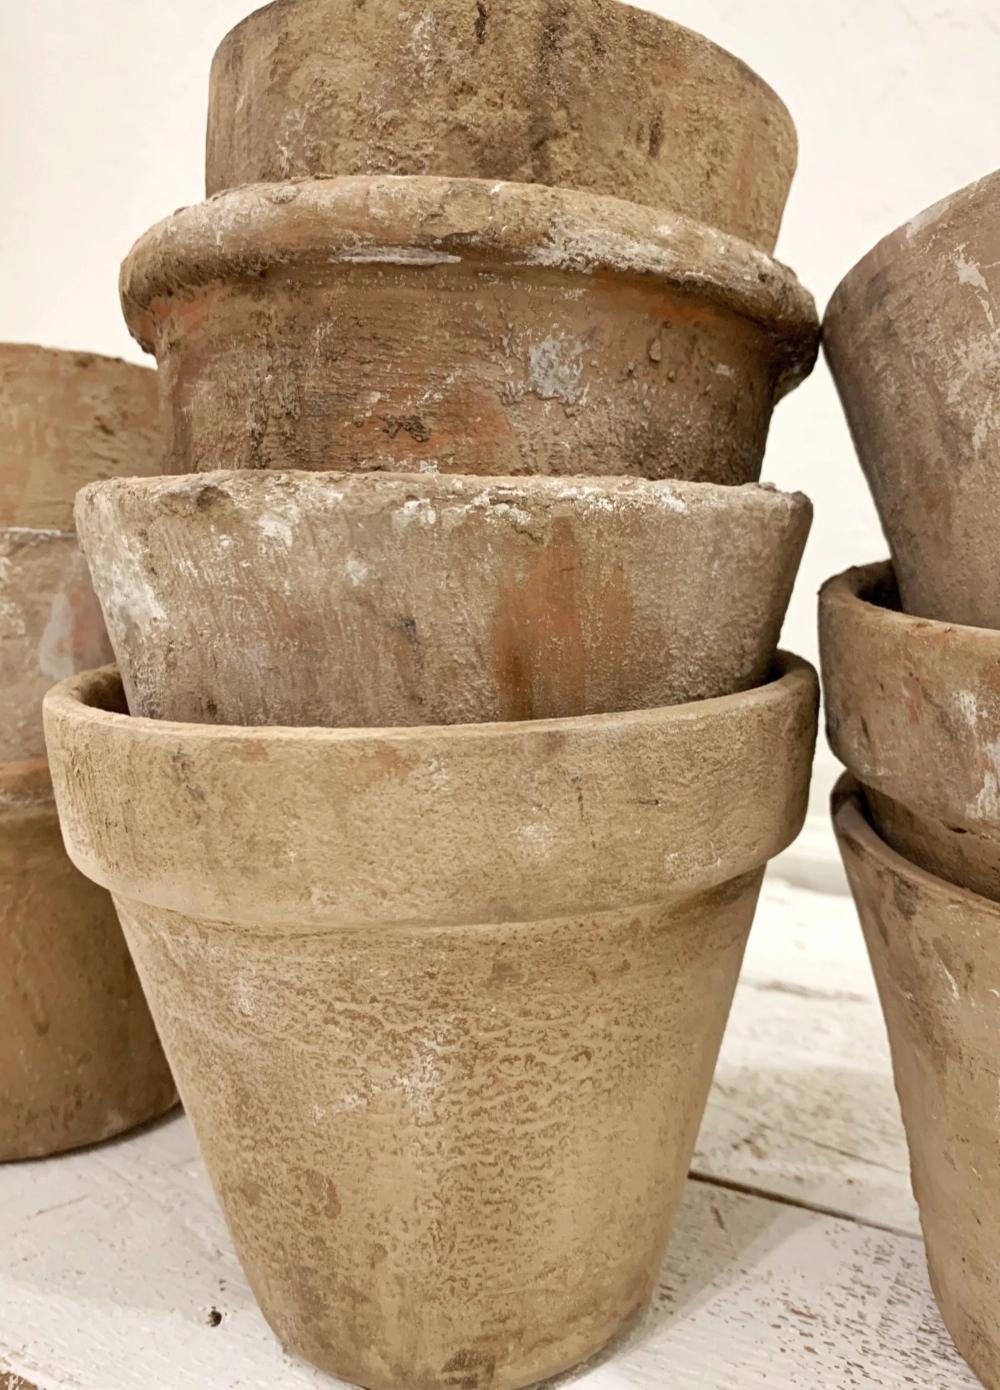 Aging Terra Cotta Pots In 2020 Aging Terra Cotta Pots Diy Terra Cotta Pots Antique Terra Cotta Pots